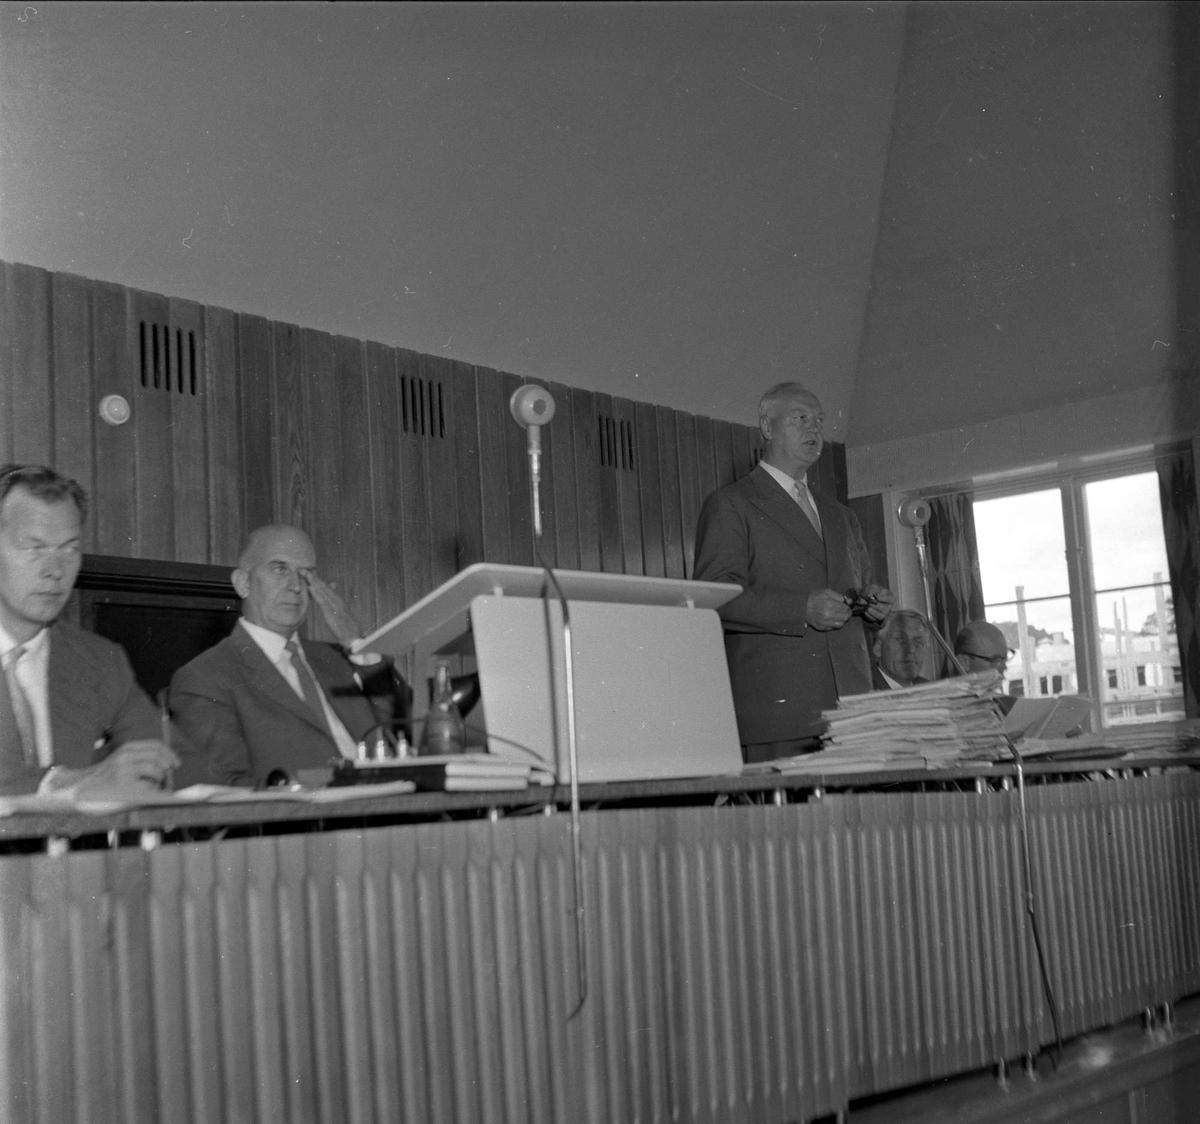 Herredstyre Bærum. 14.06.1959